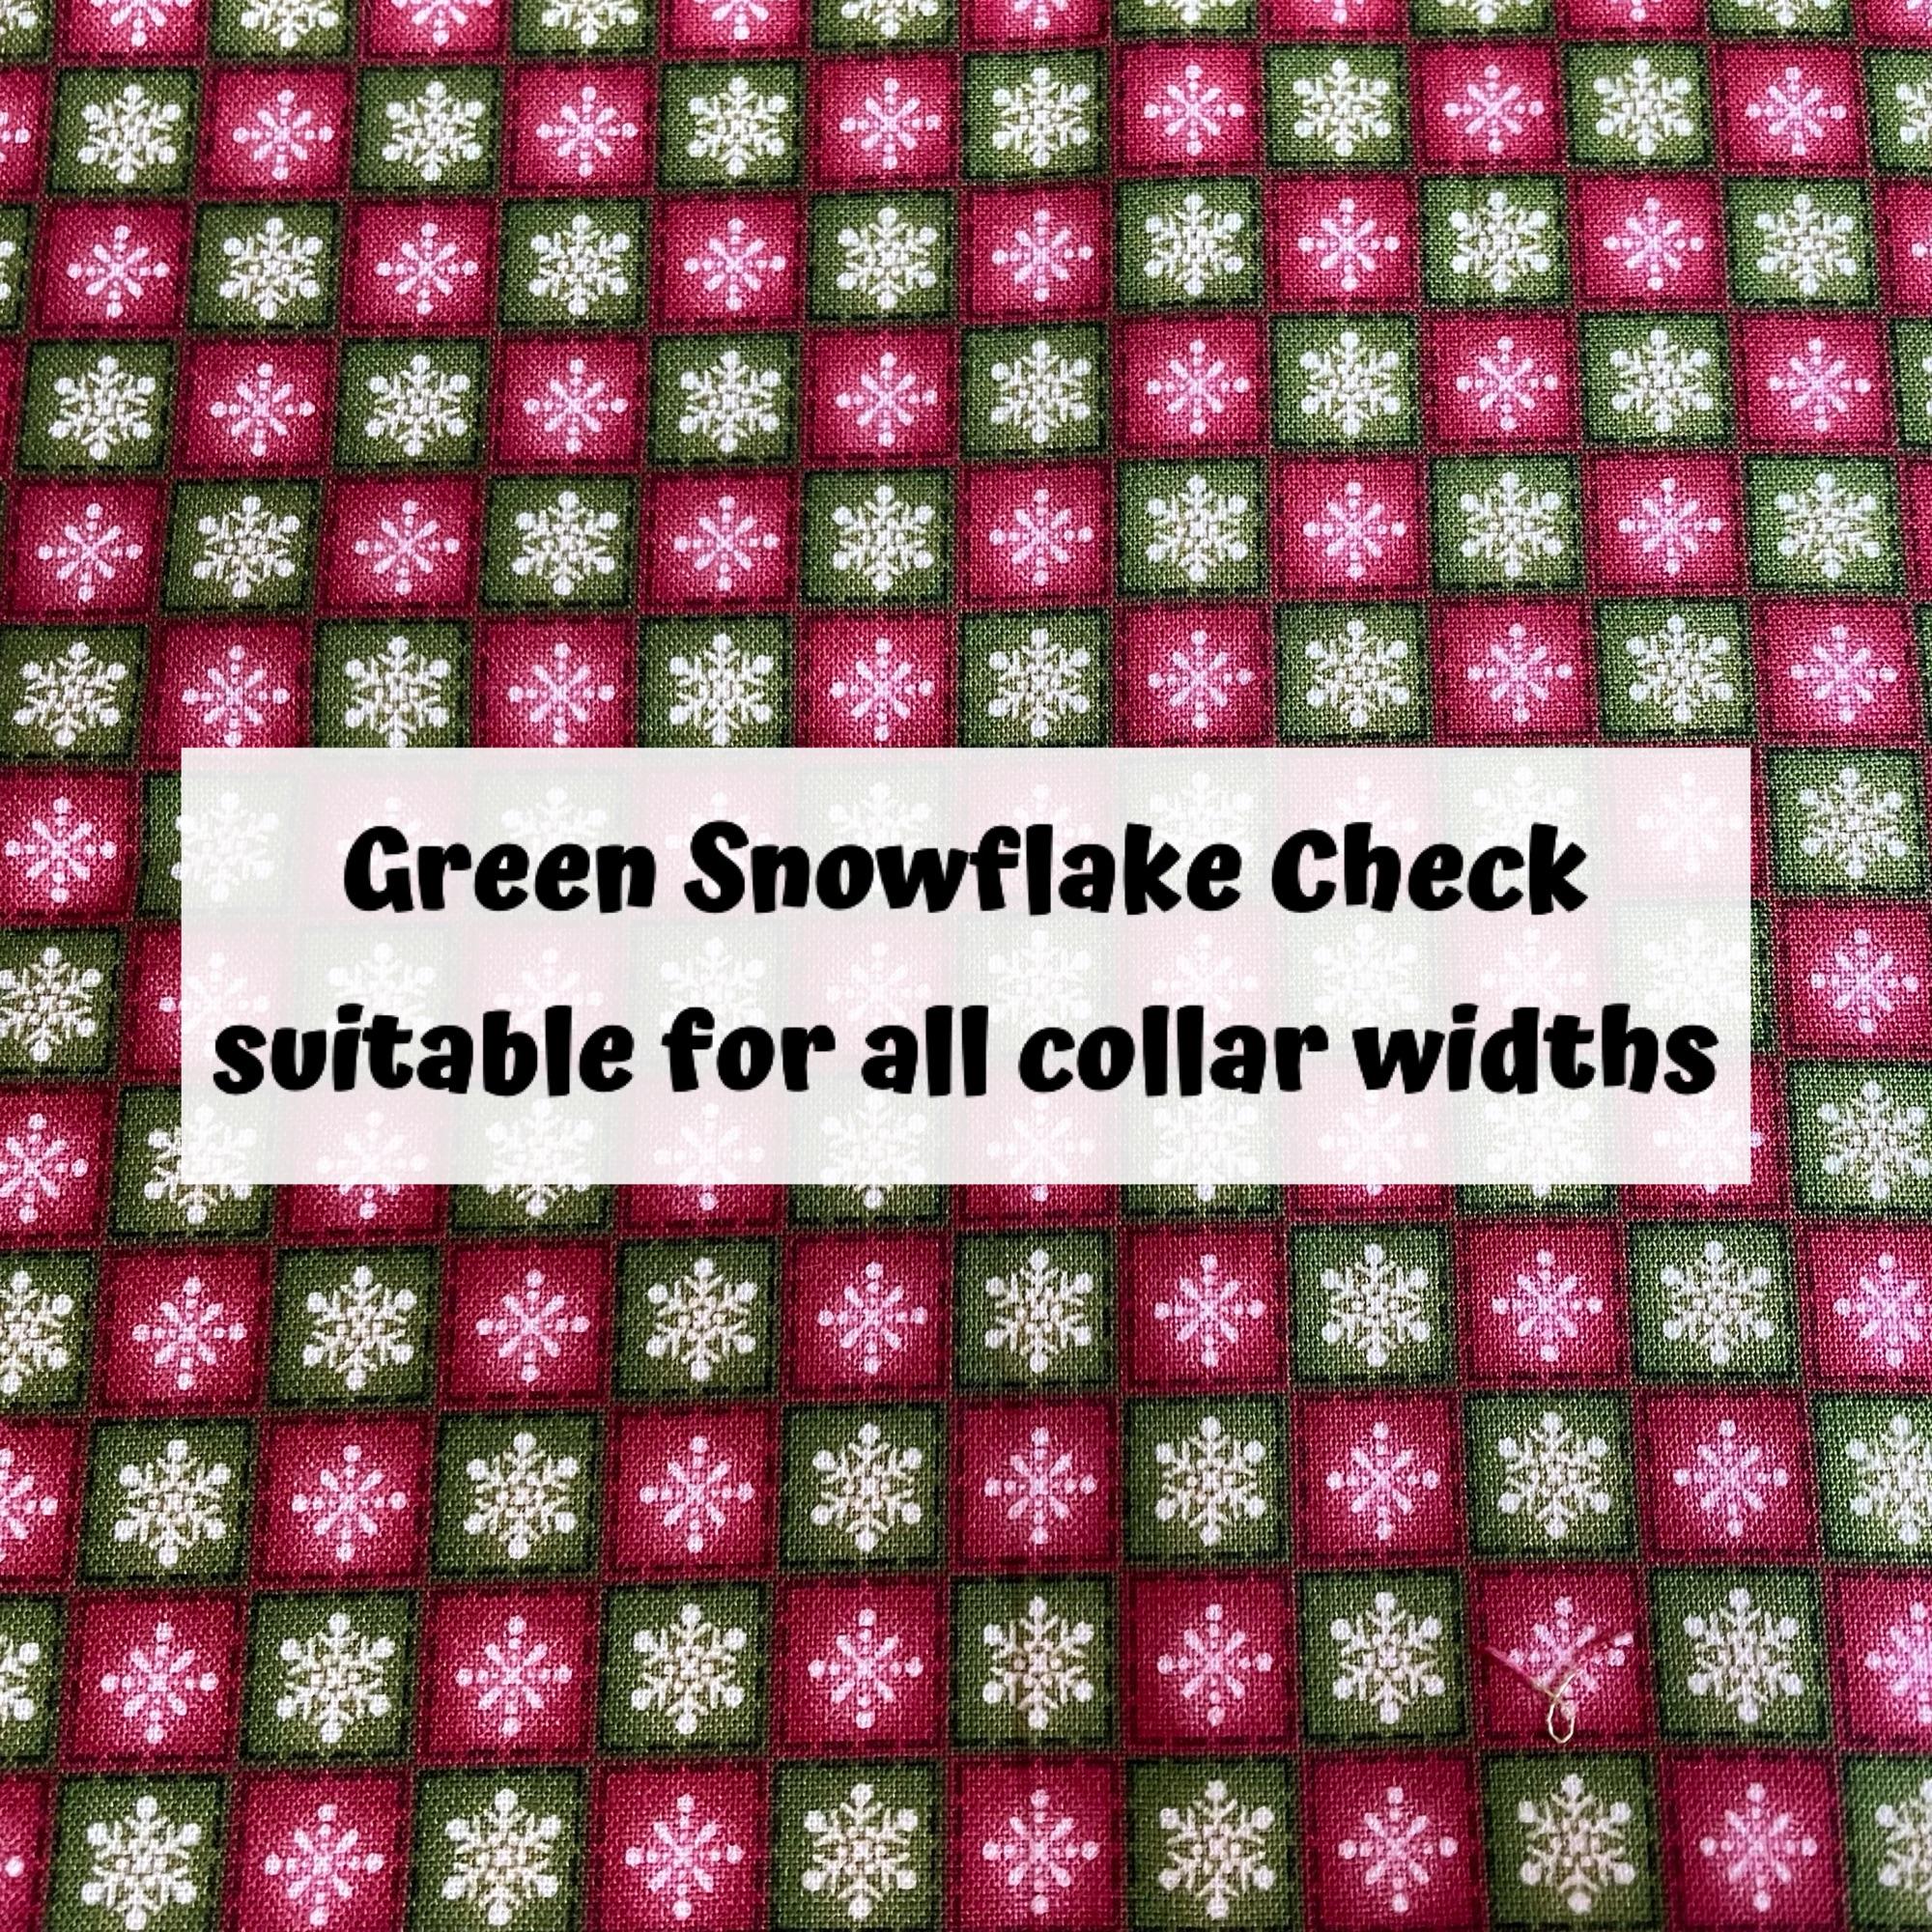 Green Snowflake Check